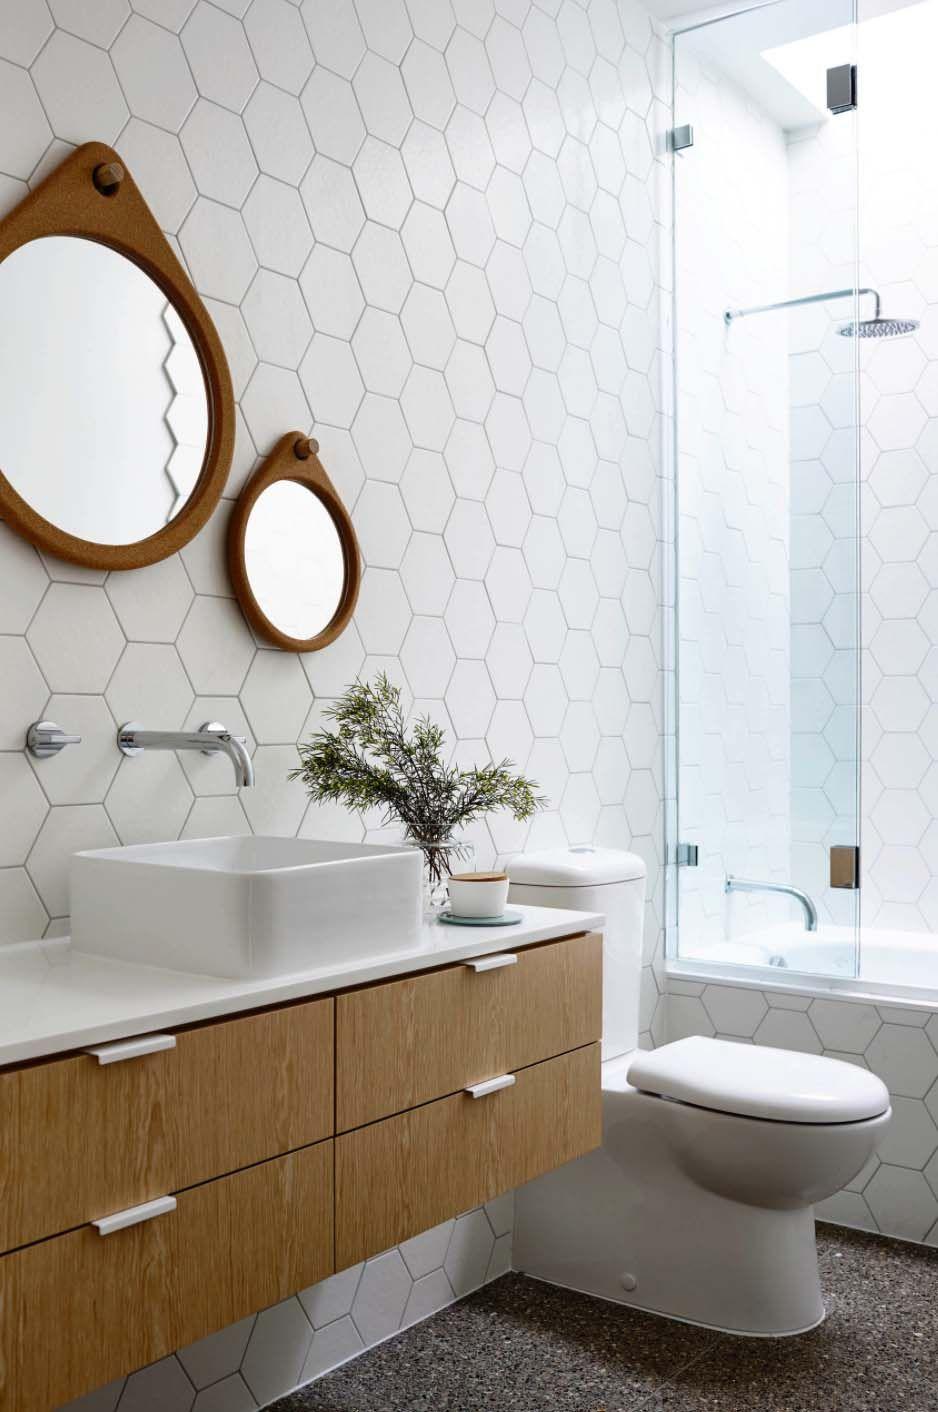 37 Amazing Mid Century Modern Bathrooms To Soak Your Senses Modern Bathroom Tile Mid Century Modern Bathroom Mid Century Bathroom